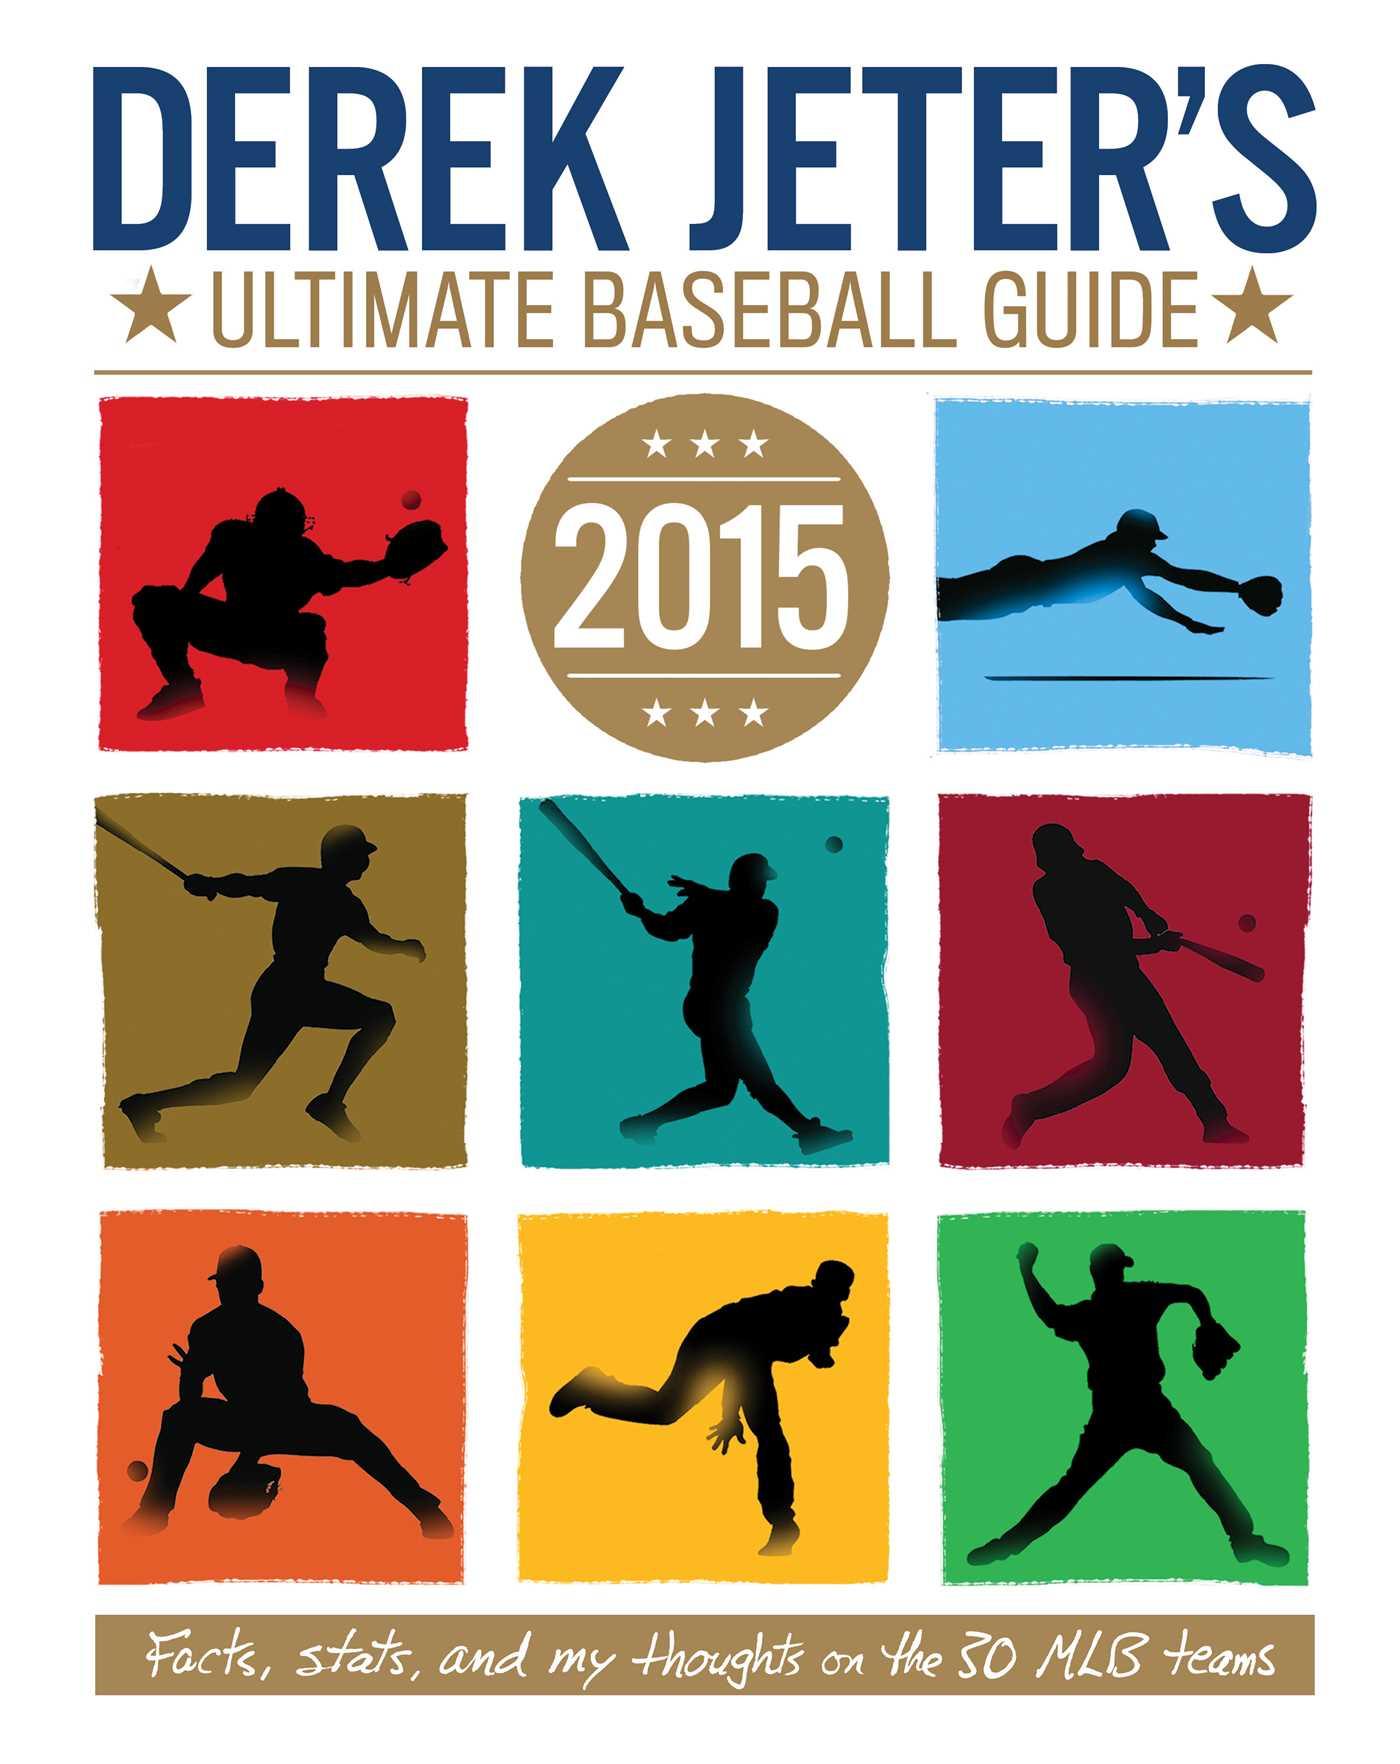 Derek jeters ultimate baseball guide 2015 9781481423182 hr